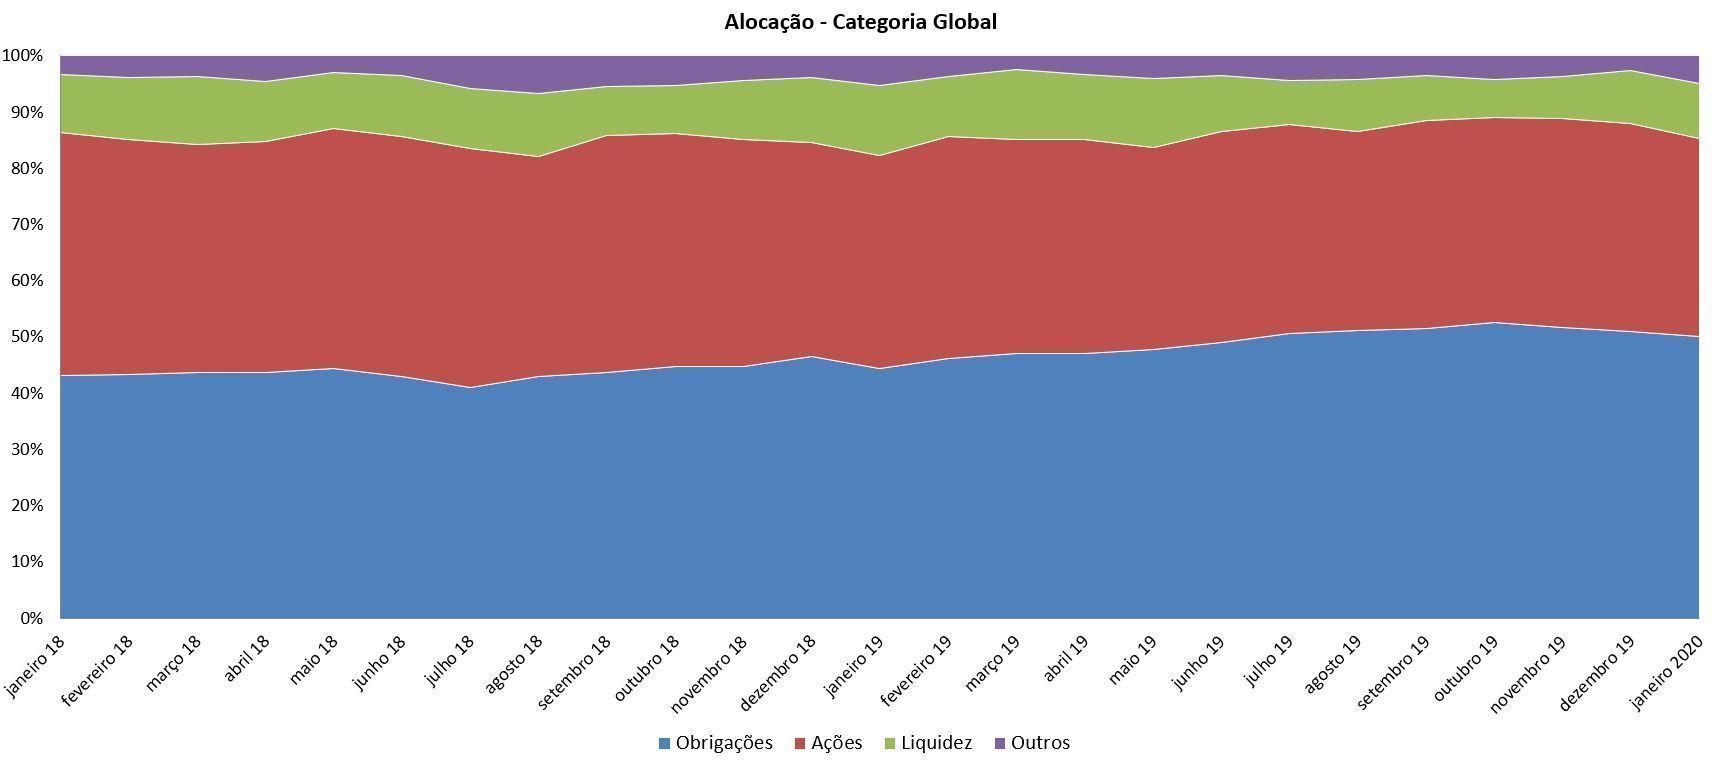 aloca__o_global